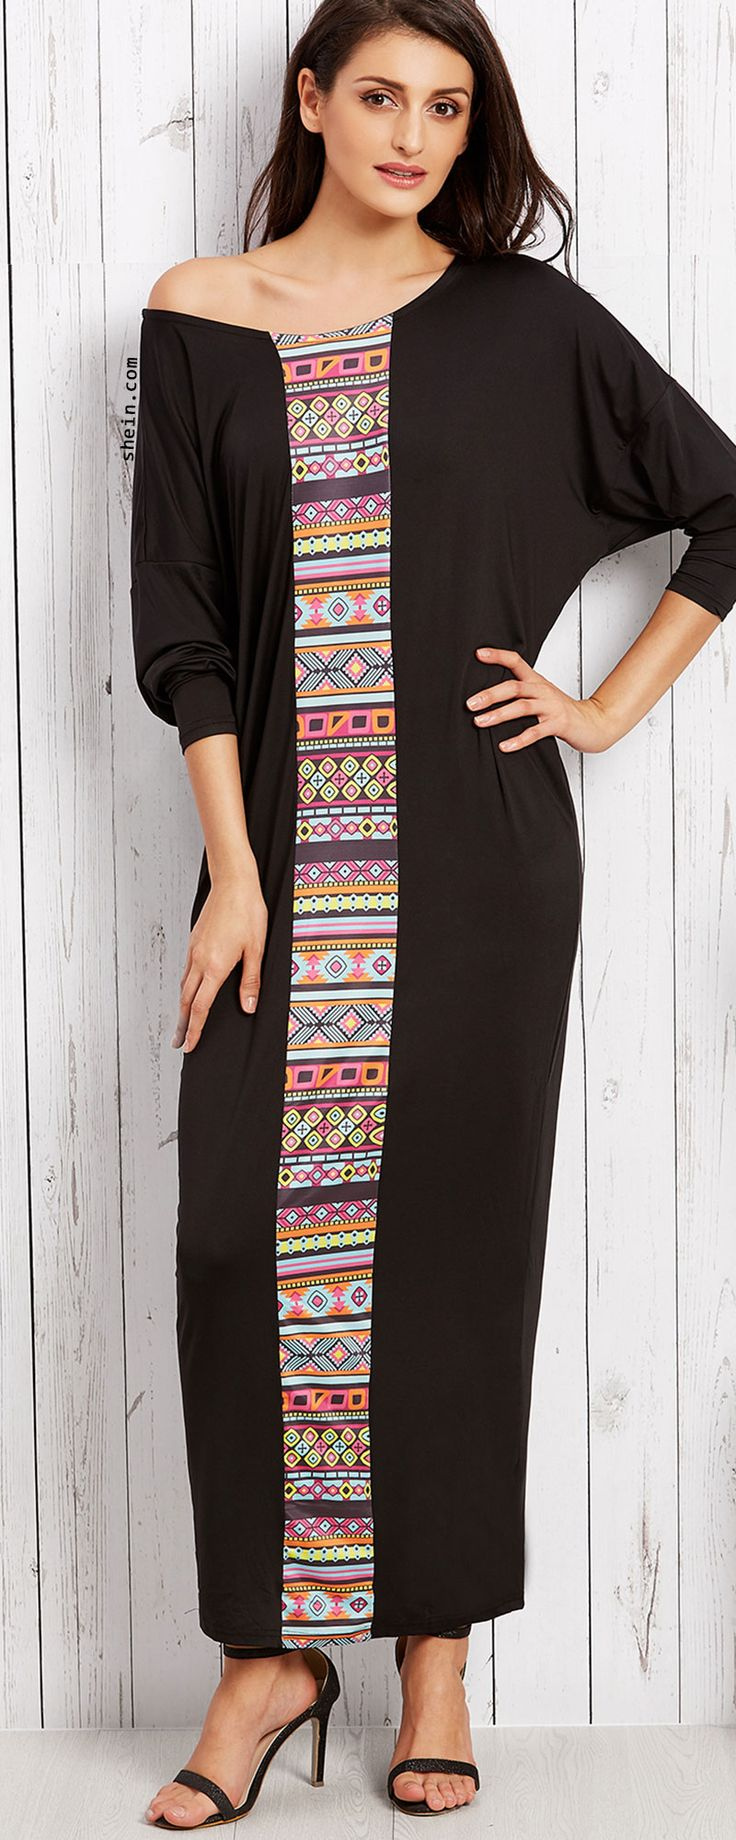 Black Tribal Print Drop Shoulder Long Sleeve Loose Maxi Dress